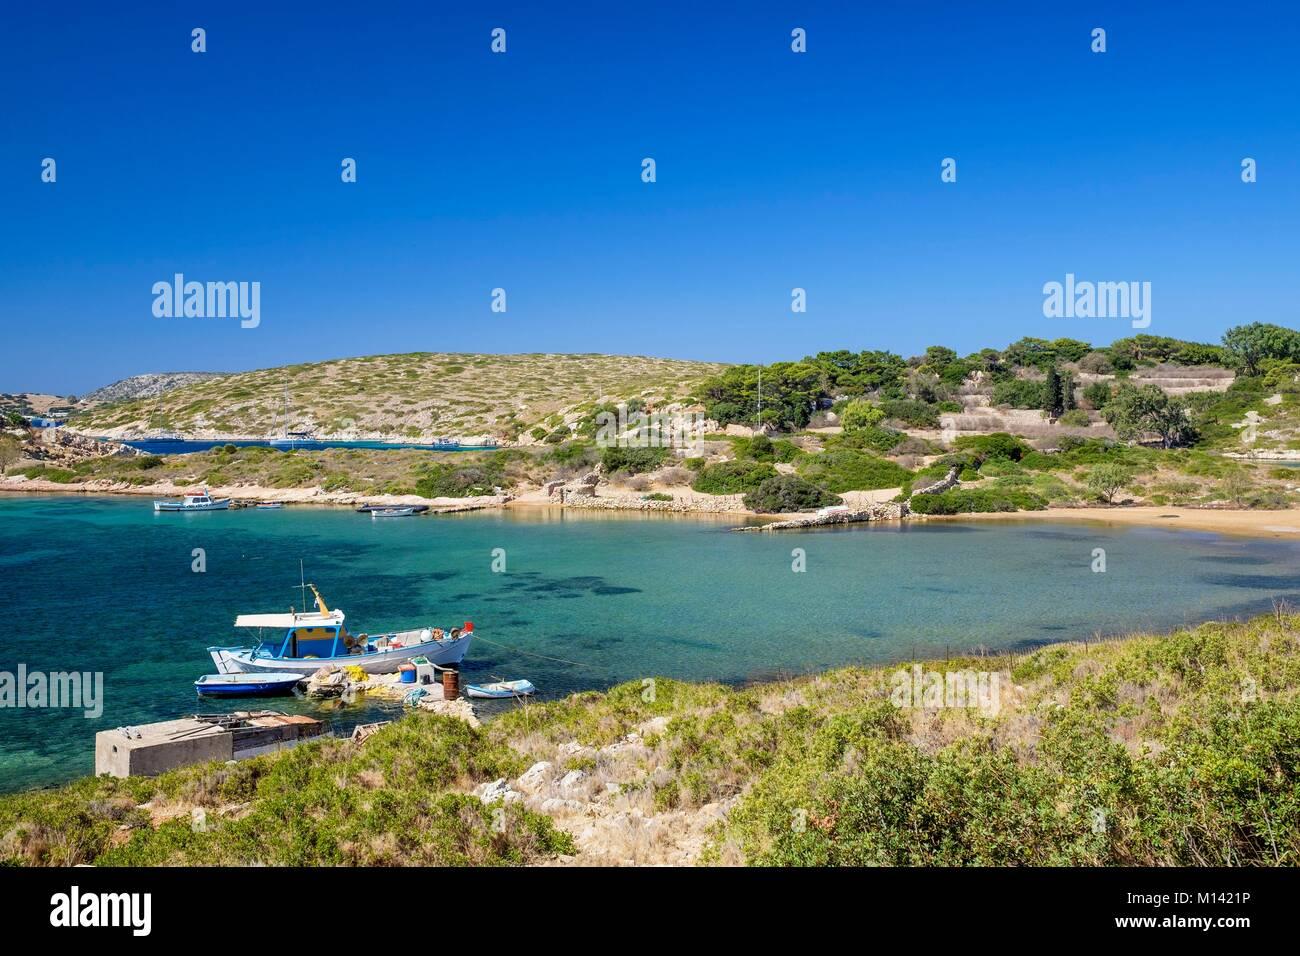 Geece, Dodecanese archipelago, Arki island, Glipapa cove - Stock Image